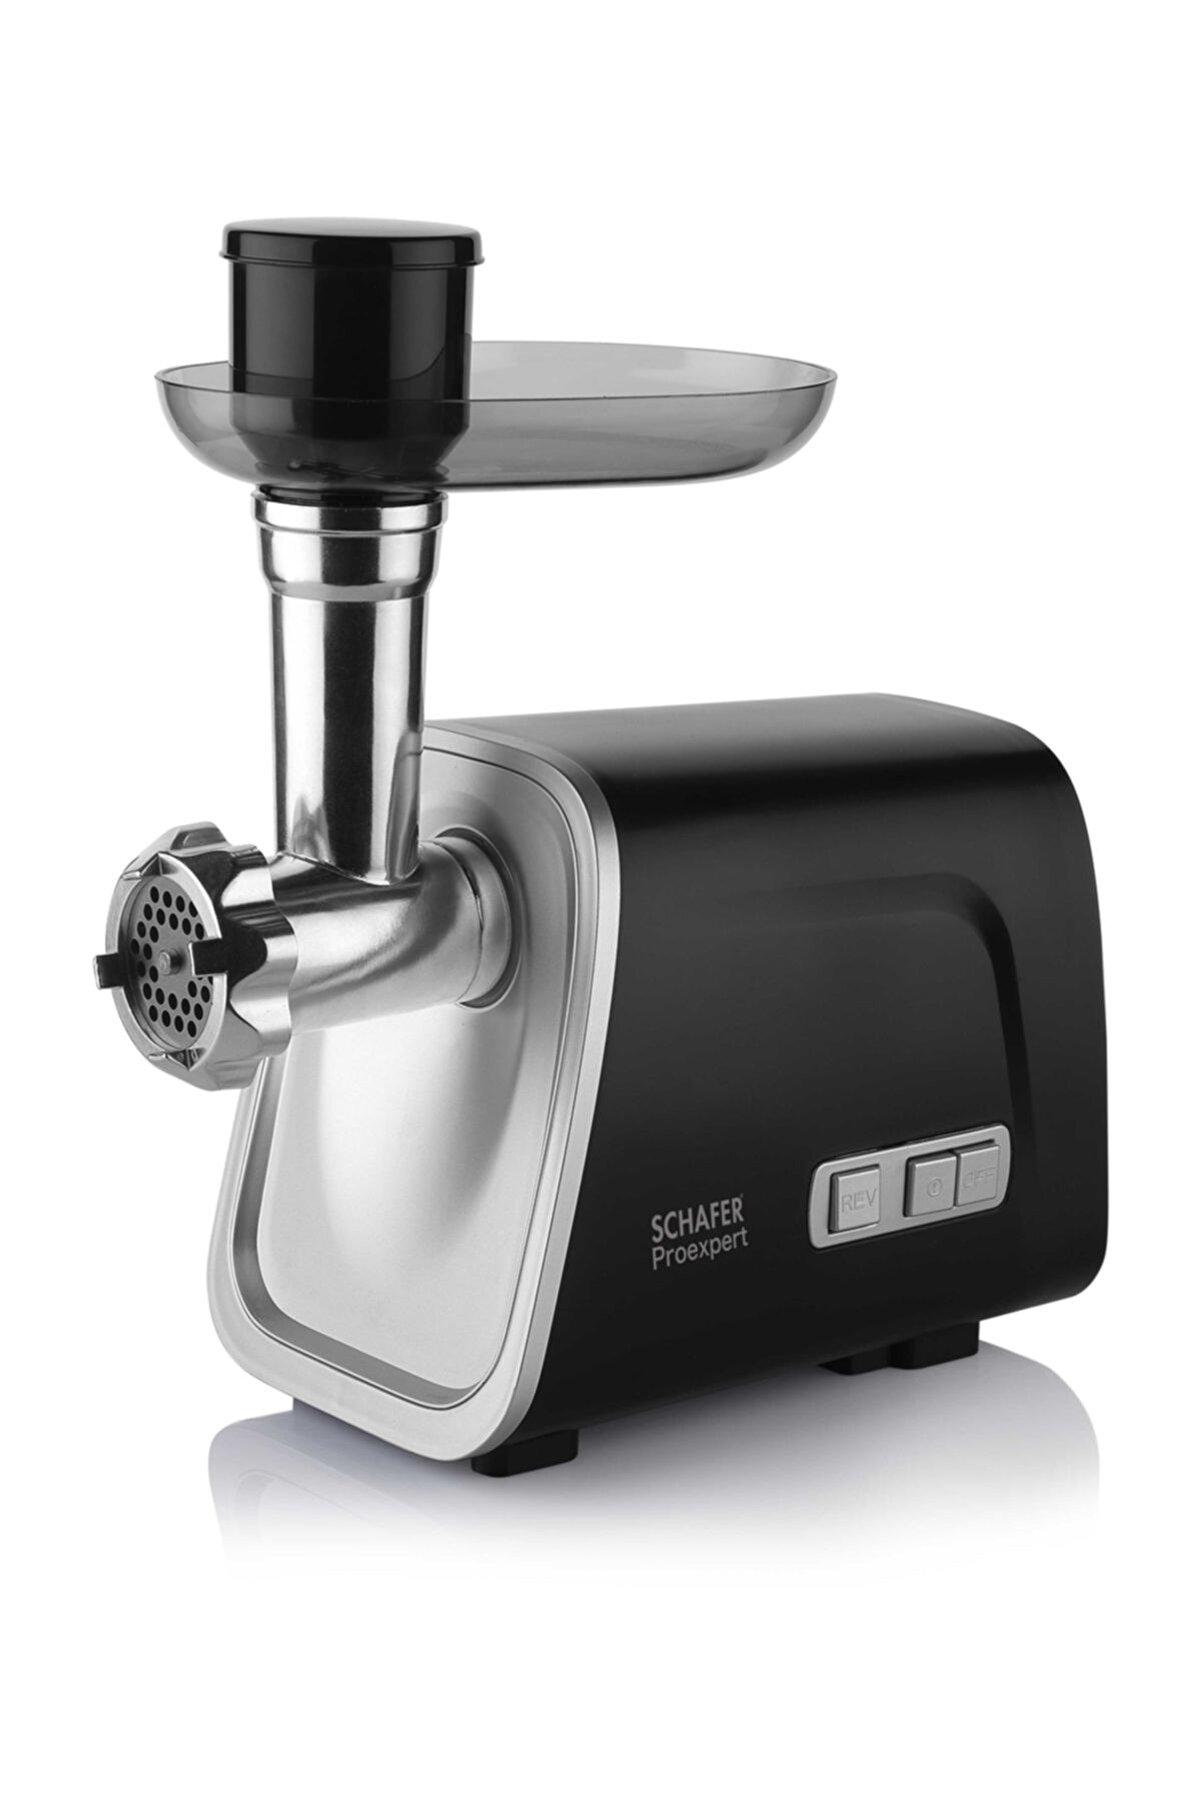 Schafer Pro Expert Kıyma Makinesi - Siyah